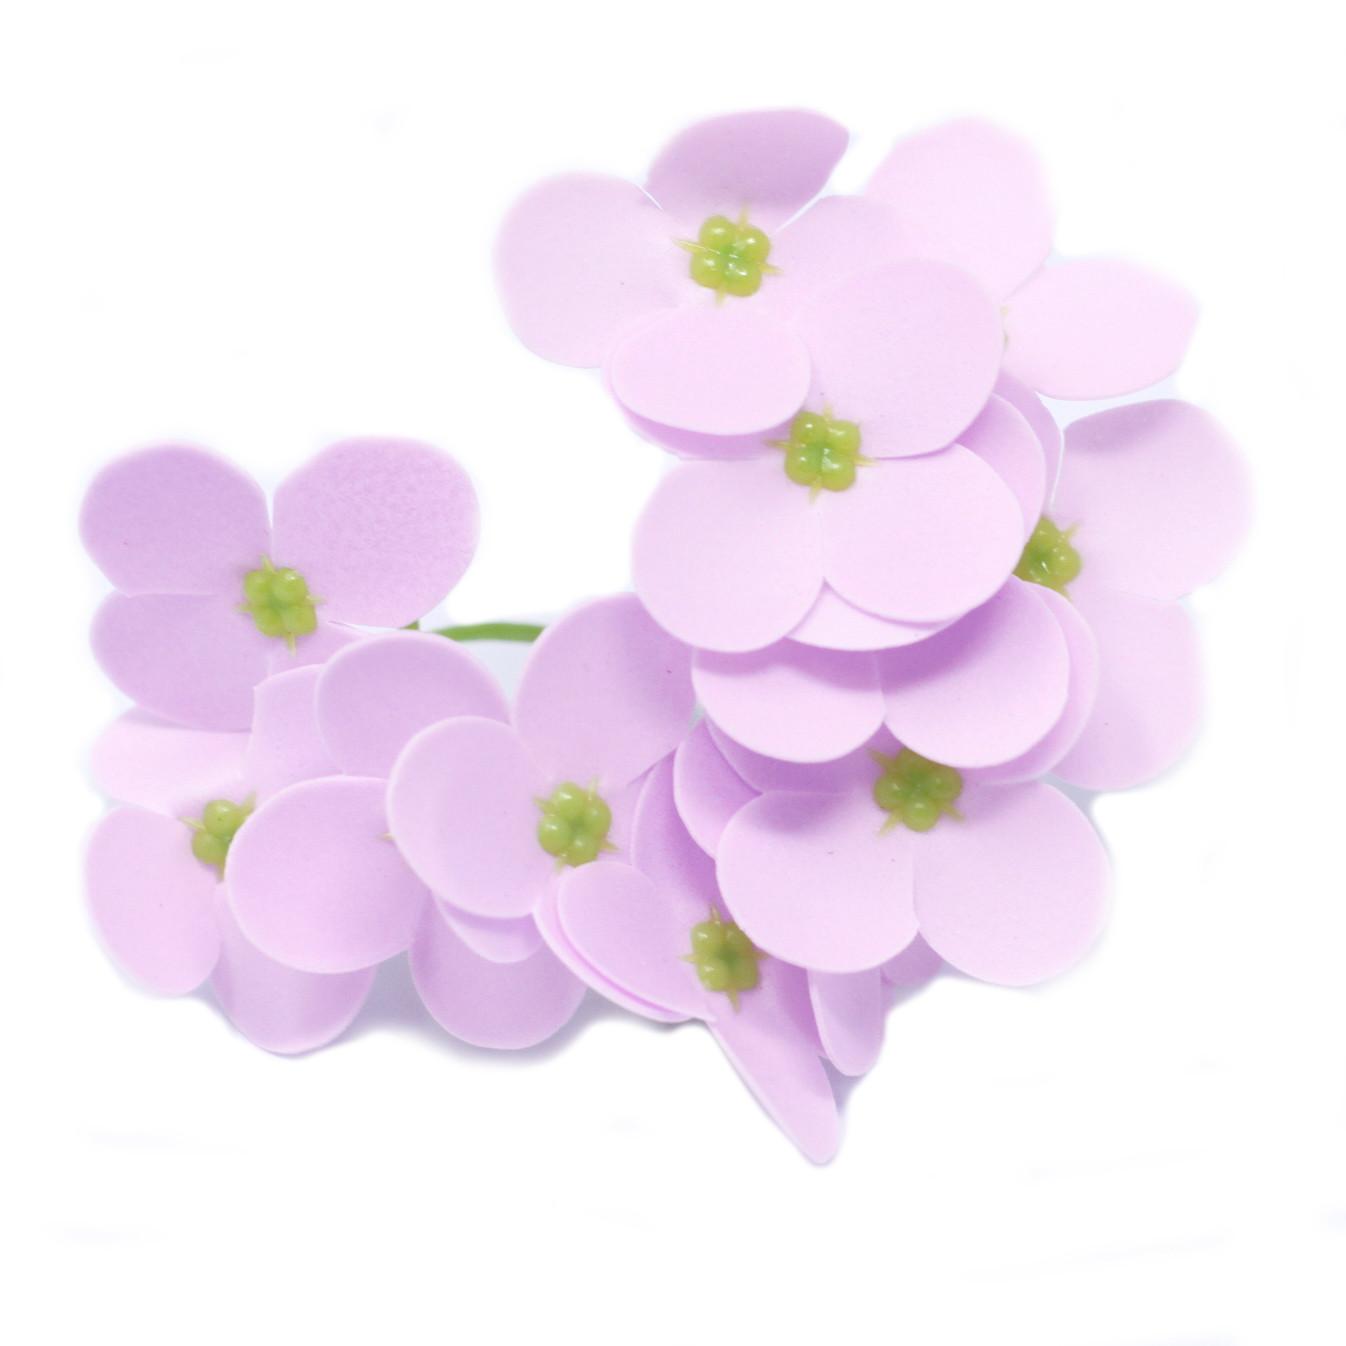 Craft Soap Flowers Hyacinth Bean Lavender